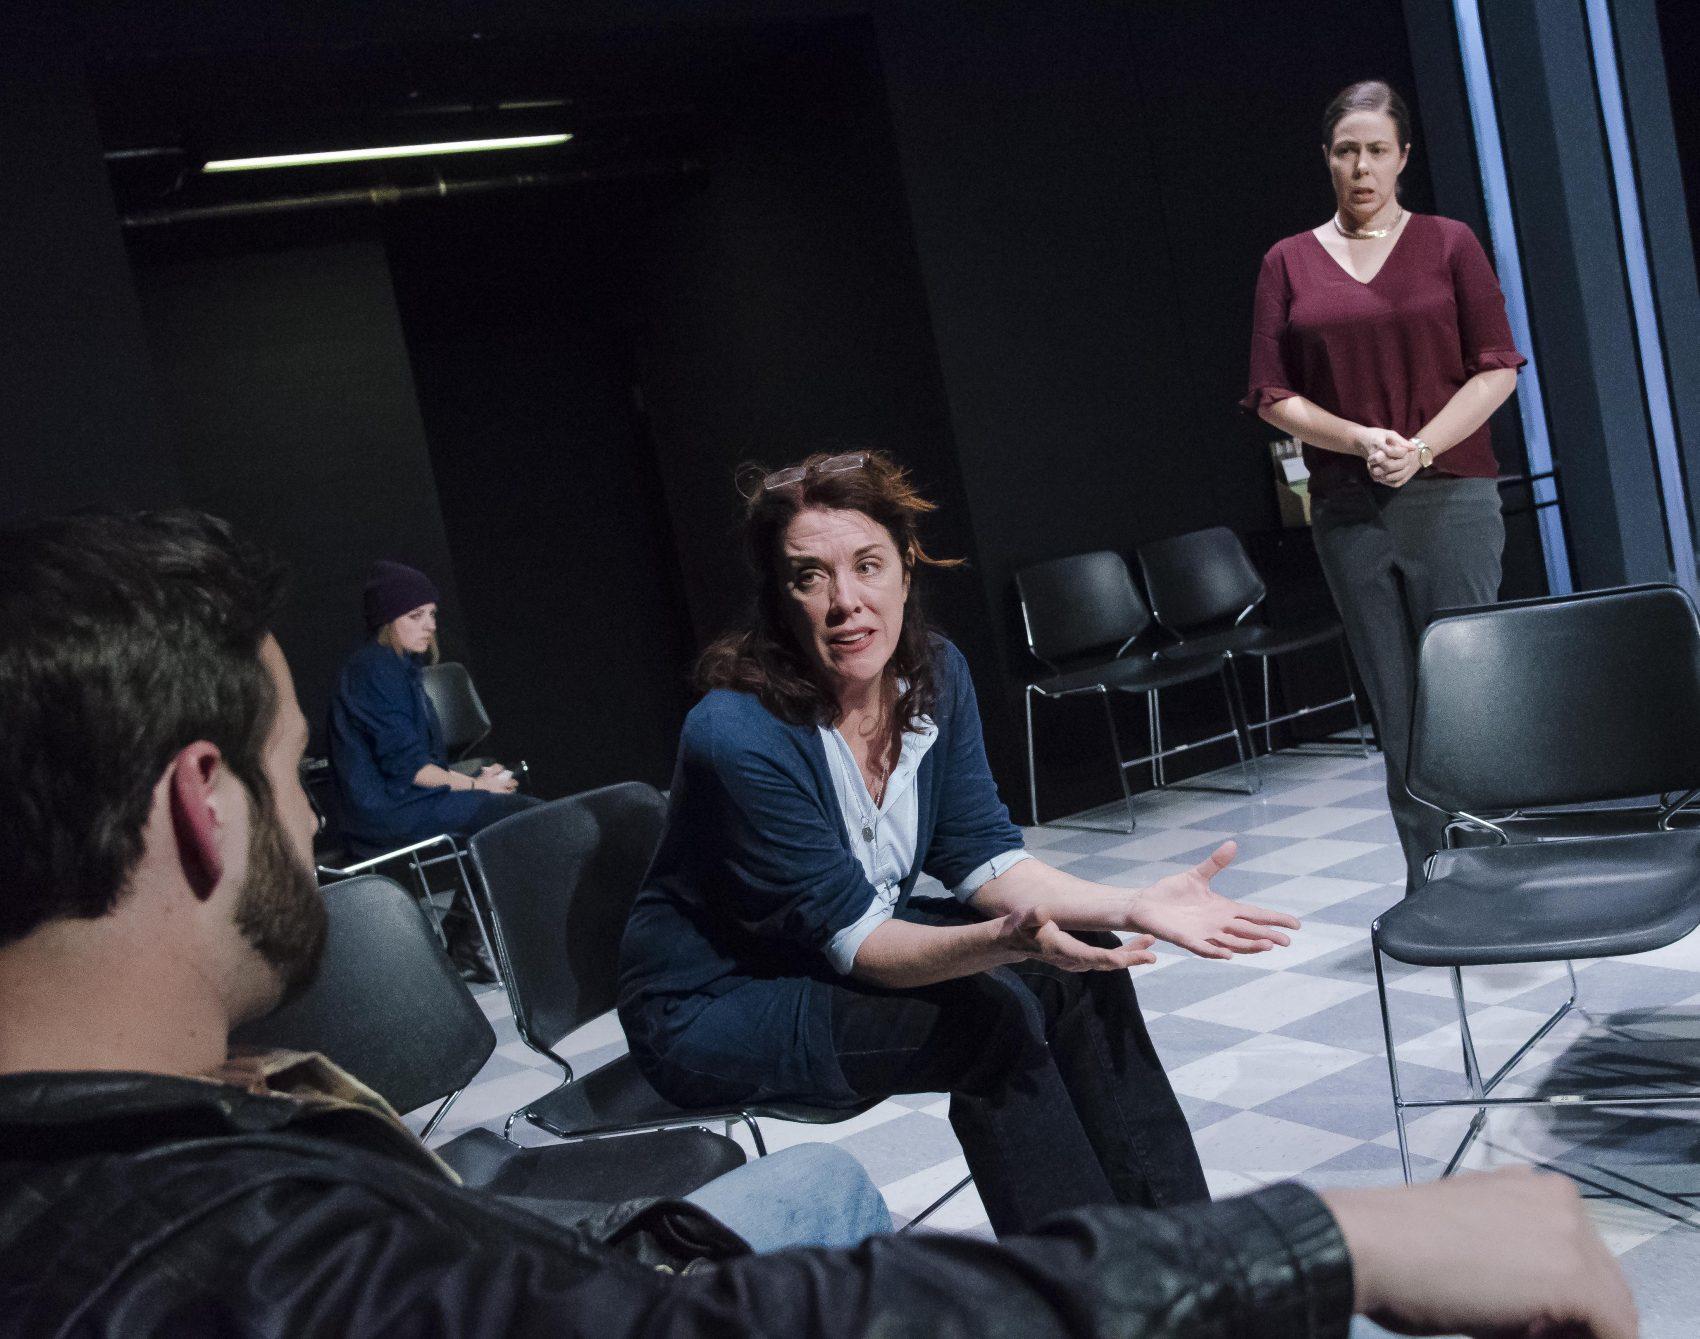 Greg Maraio as Skip, Abby Knipp as Sam, Maureen Keiller as Maureen, and Christine Power as Patty. (Courtesy Kalman Zabarsky/Boston Playwrights' Theatre)